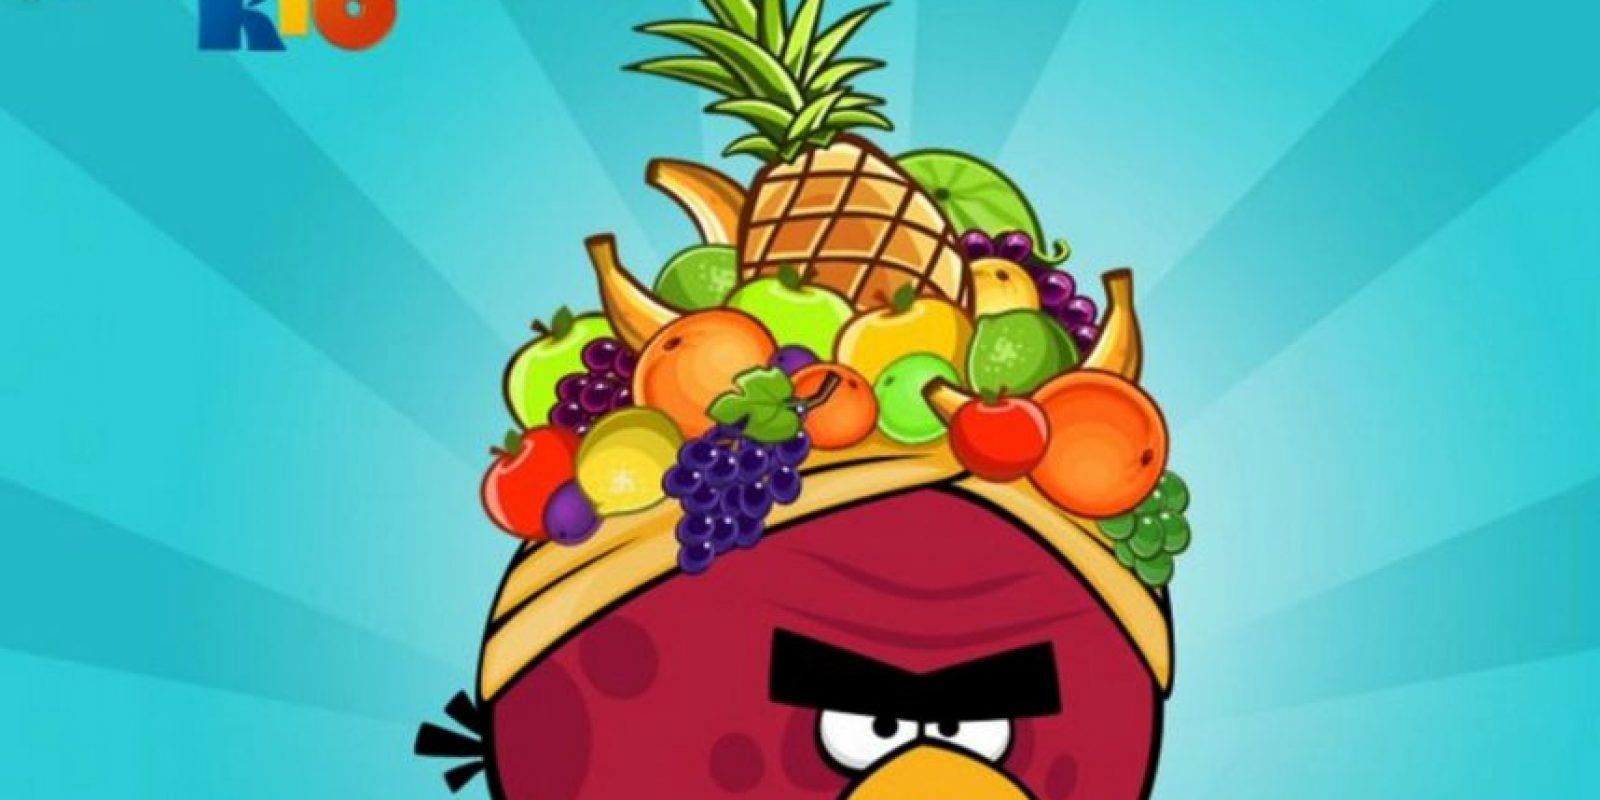 Angry Birds Rio (2011) Foto:Rovio Entertainment Ltd